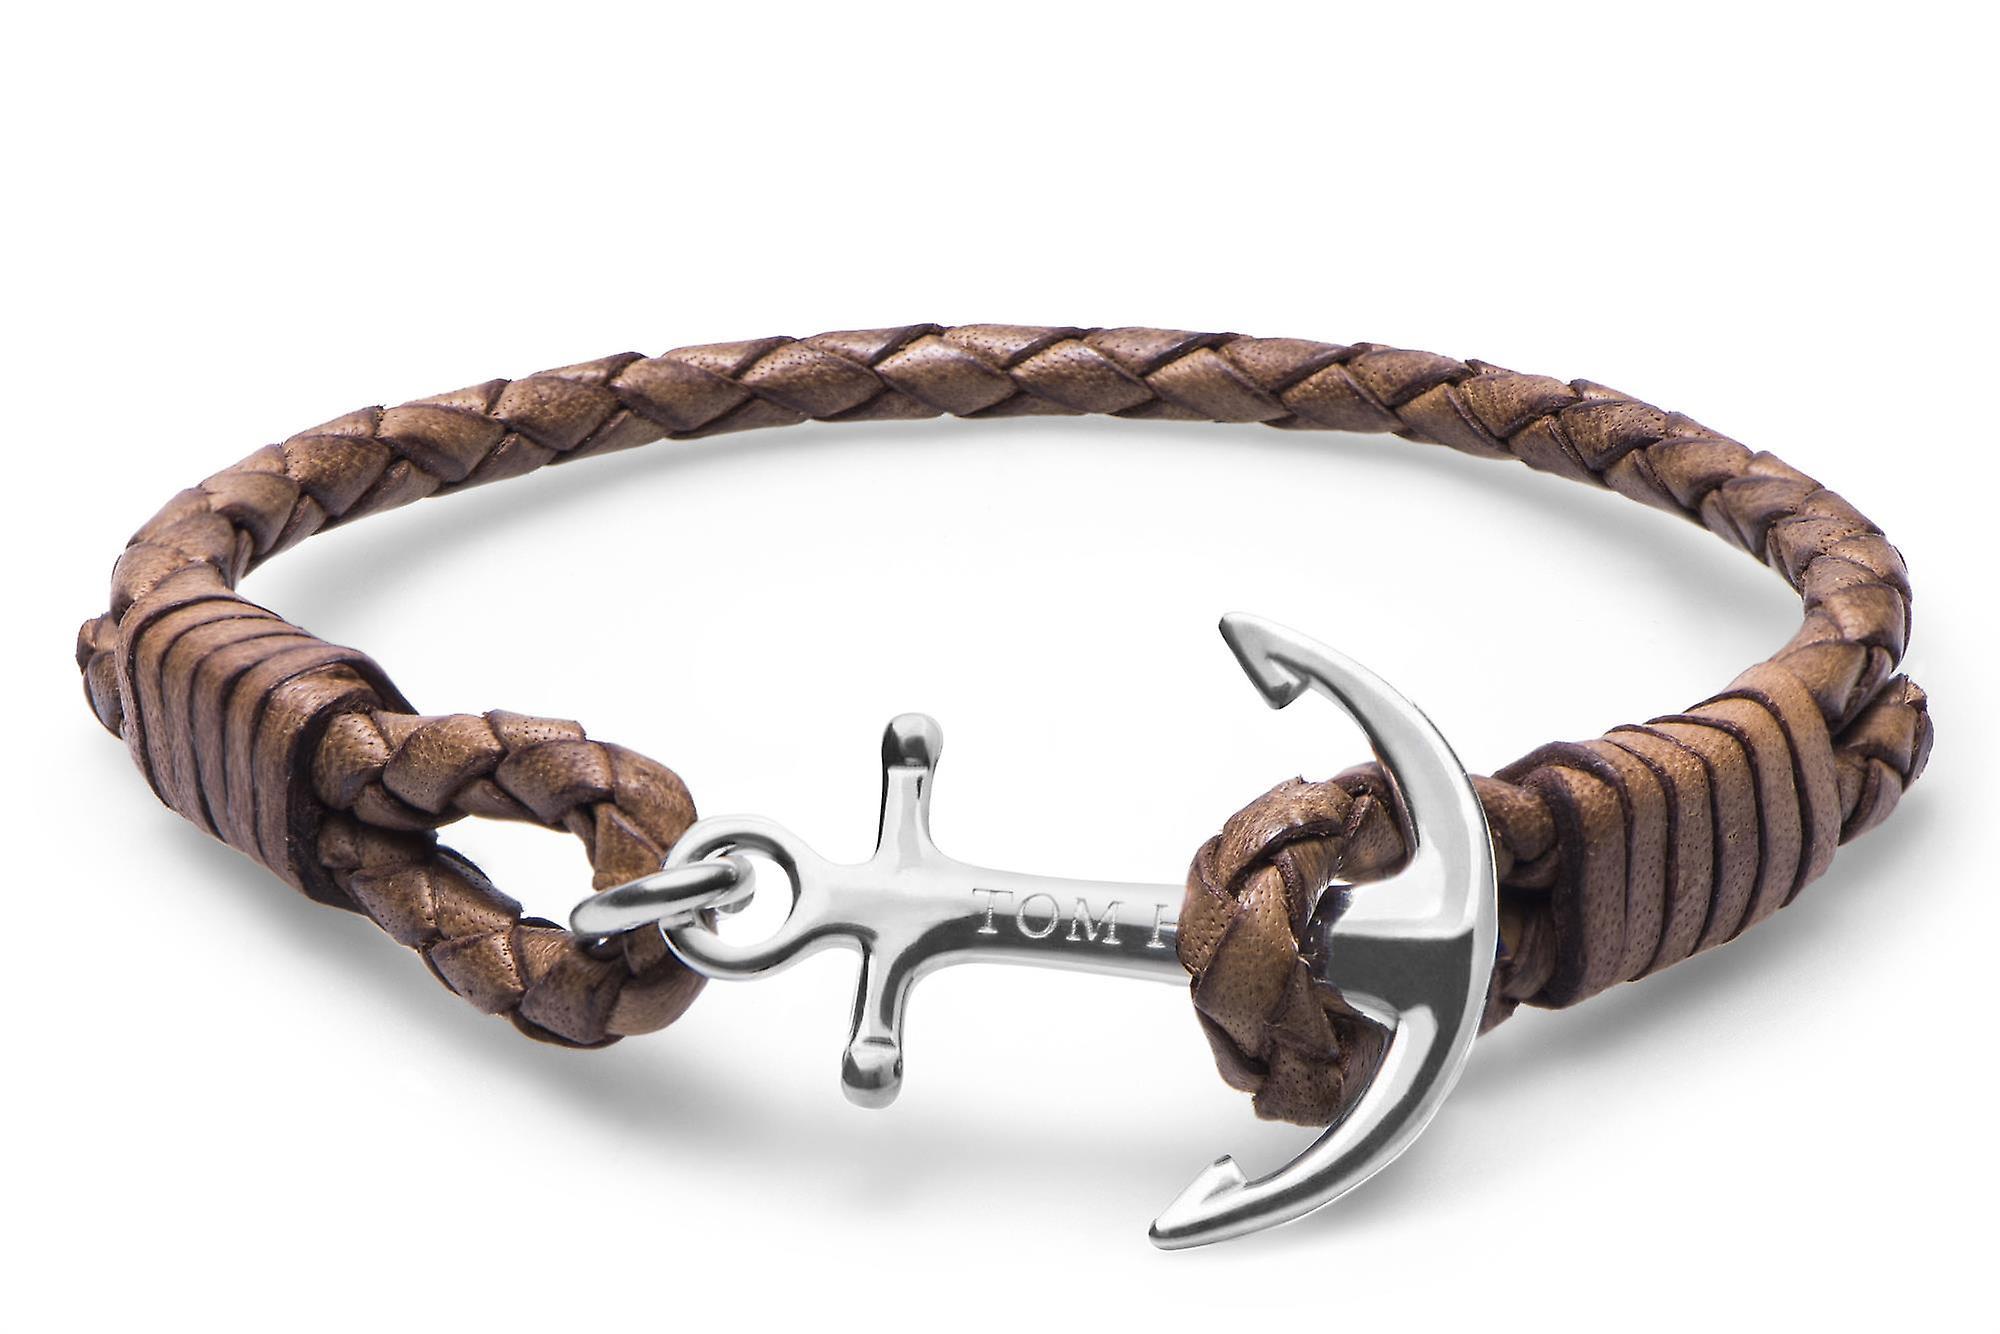 Tom Hope Cognac Brown Sterling Silver Bracelet Small TM0220